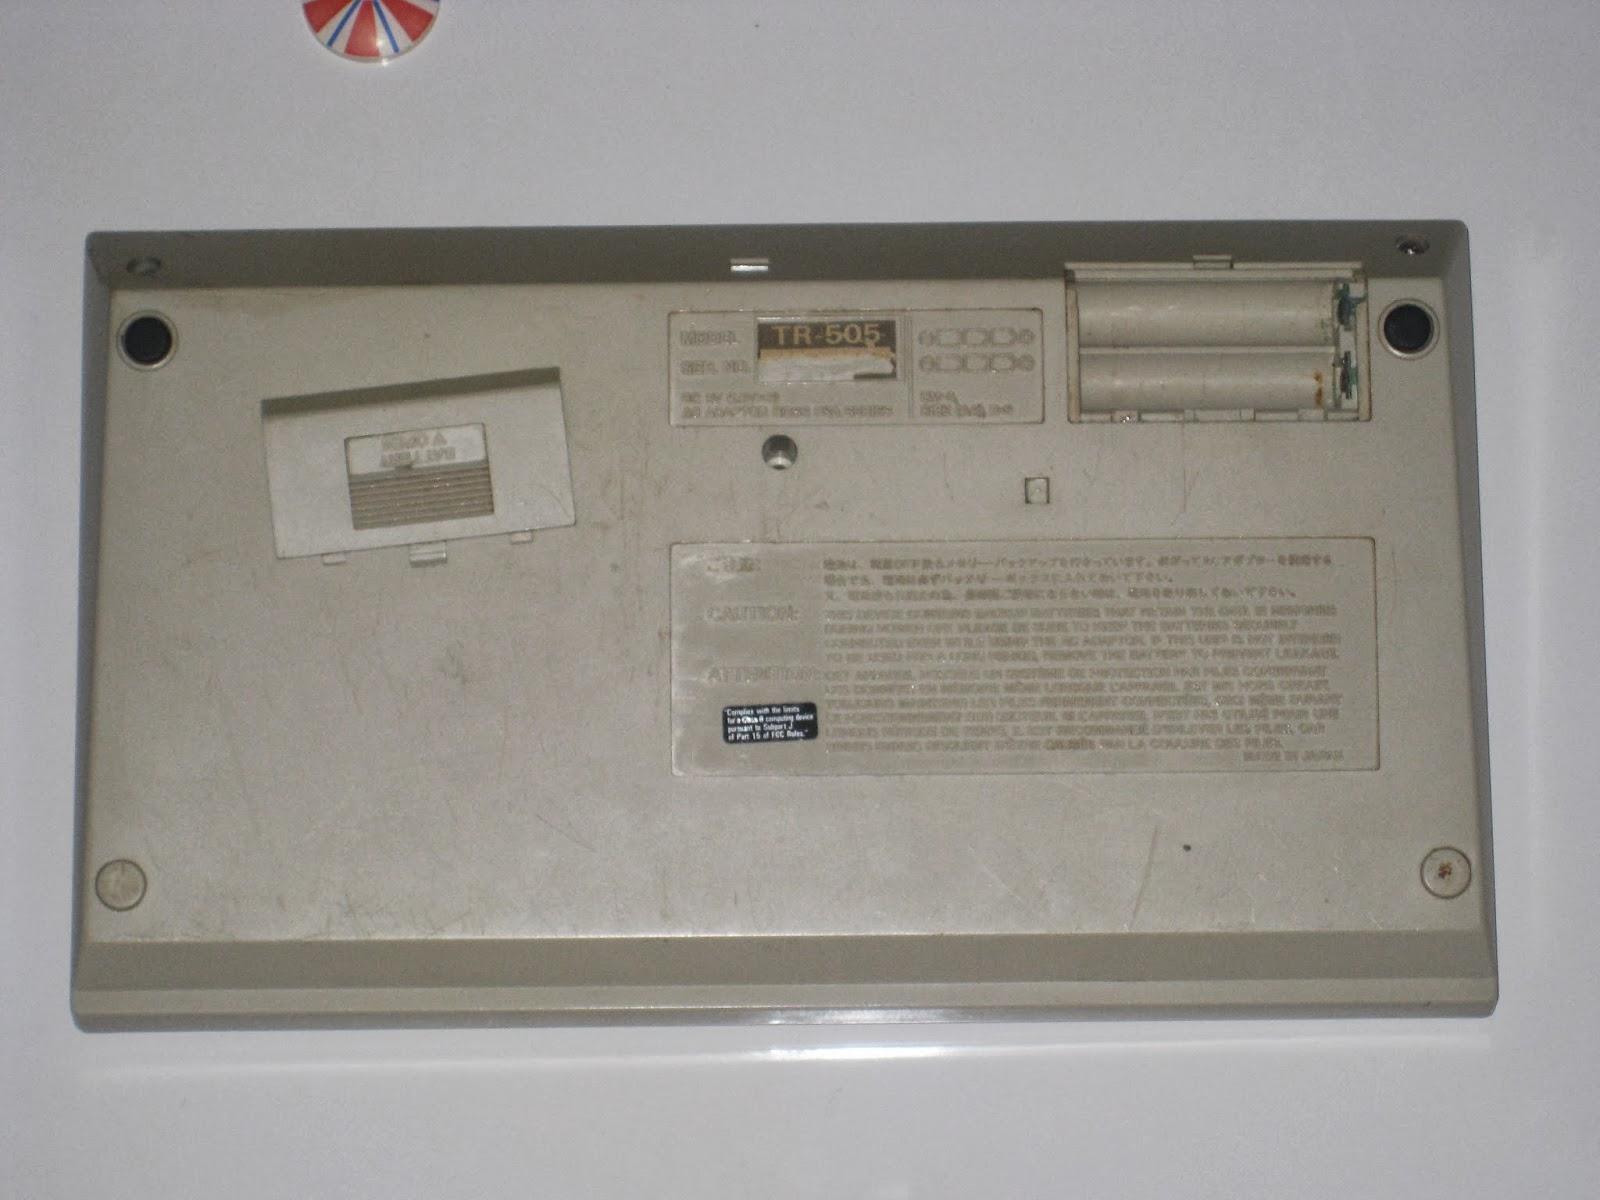 roland mc 505 user manual